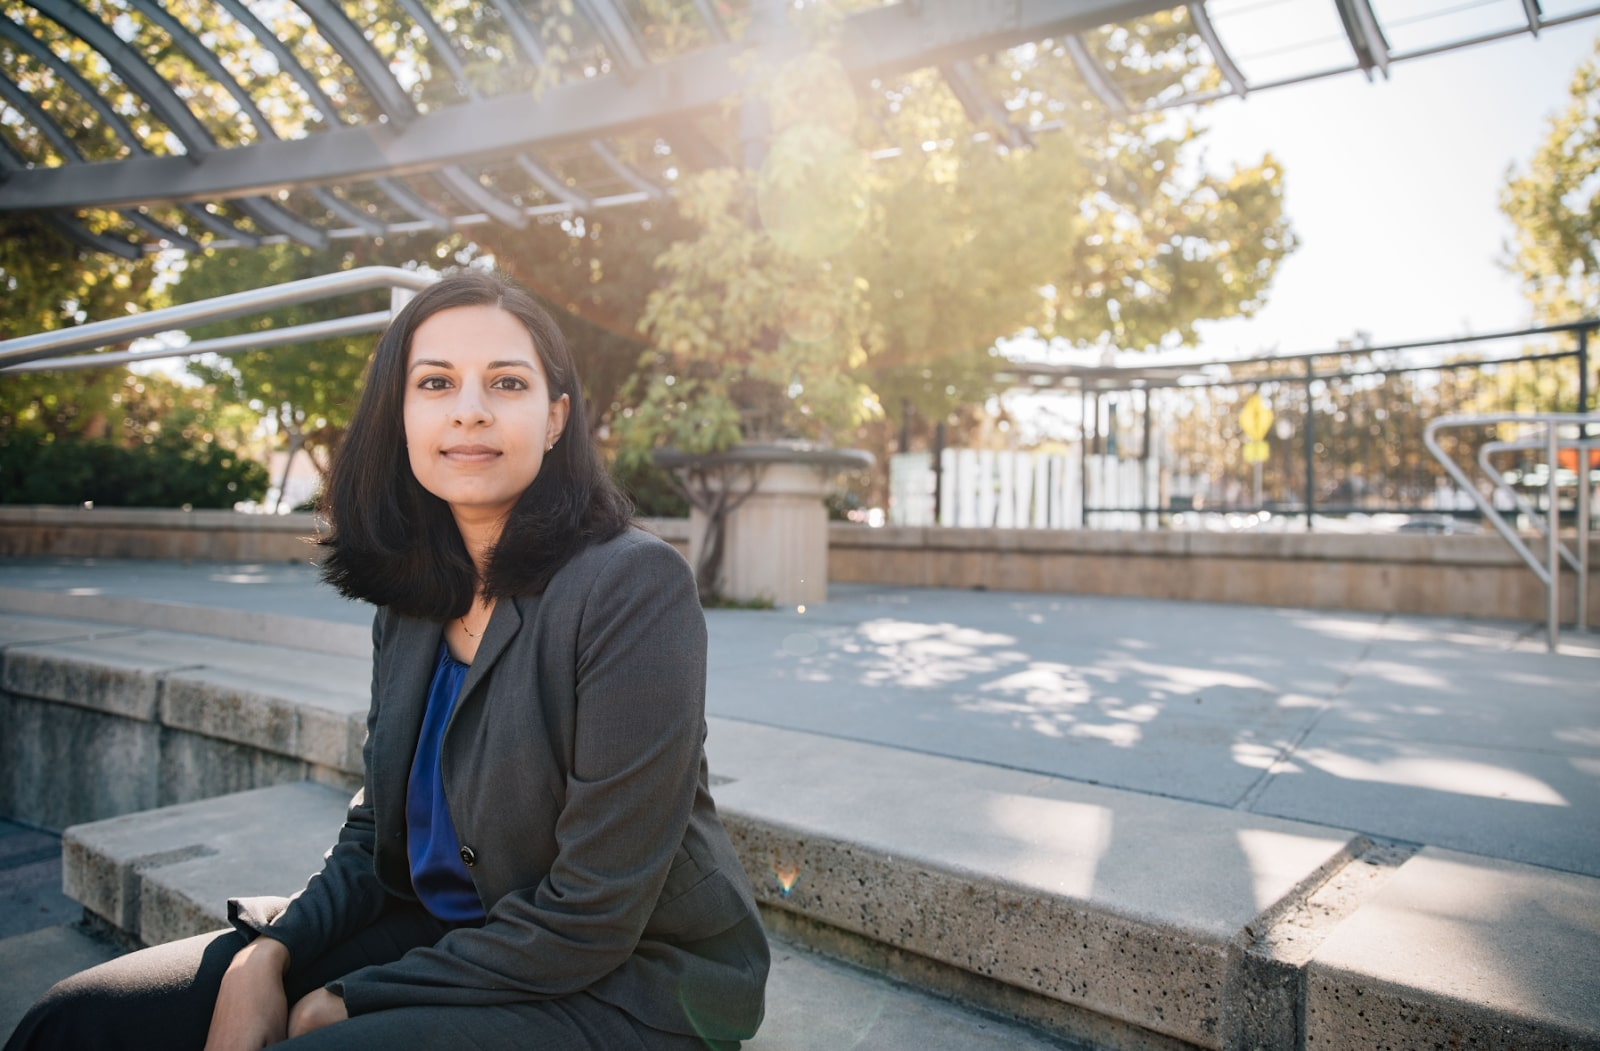 Nila Bala sitting on steps at a park